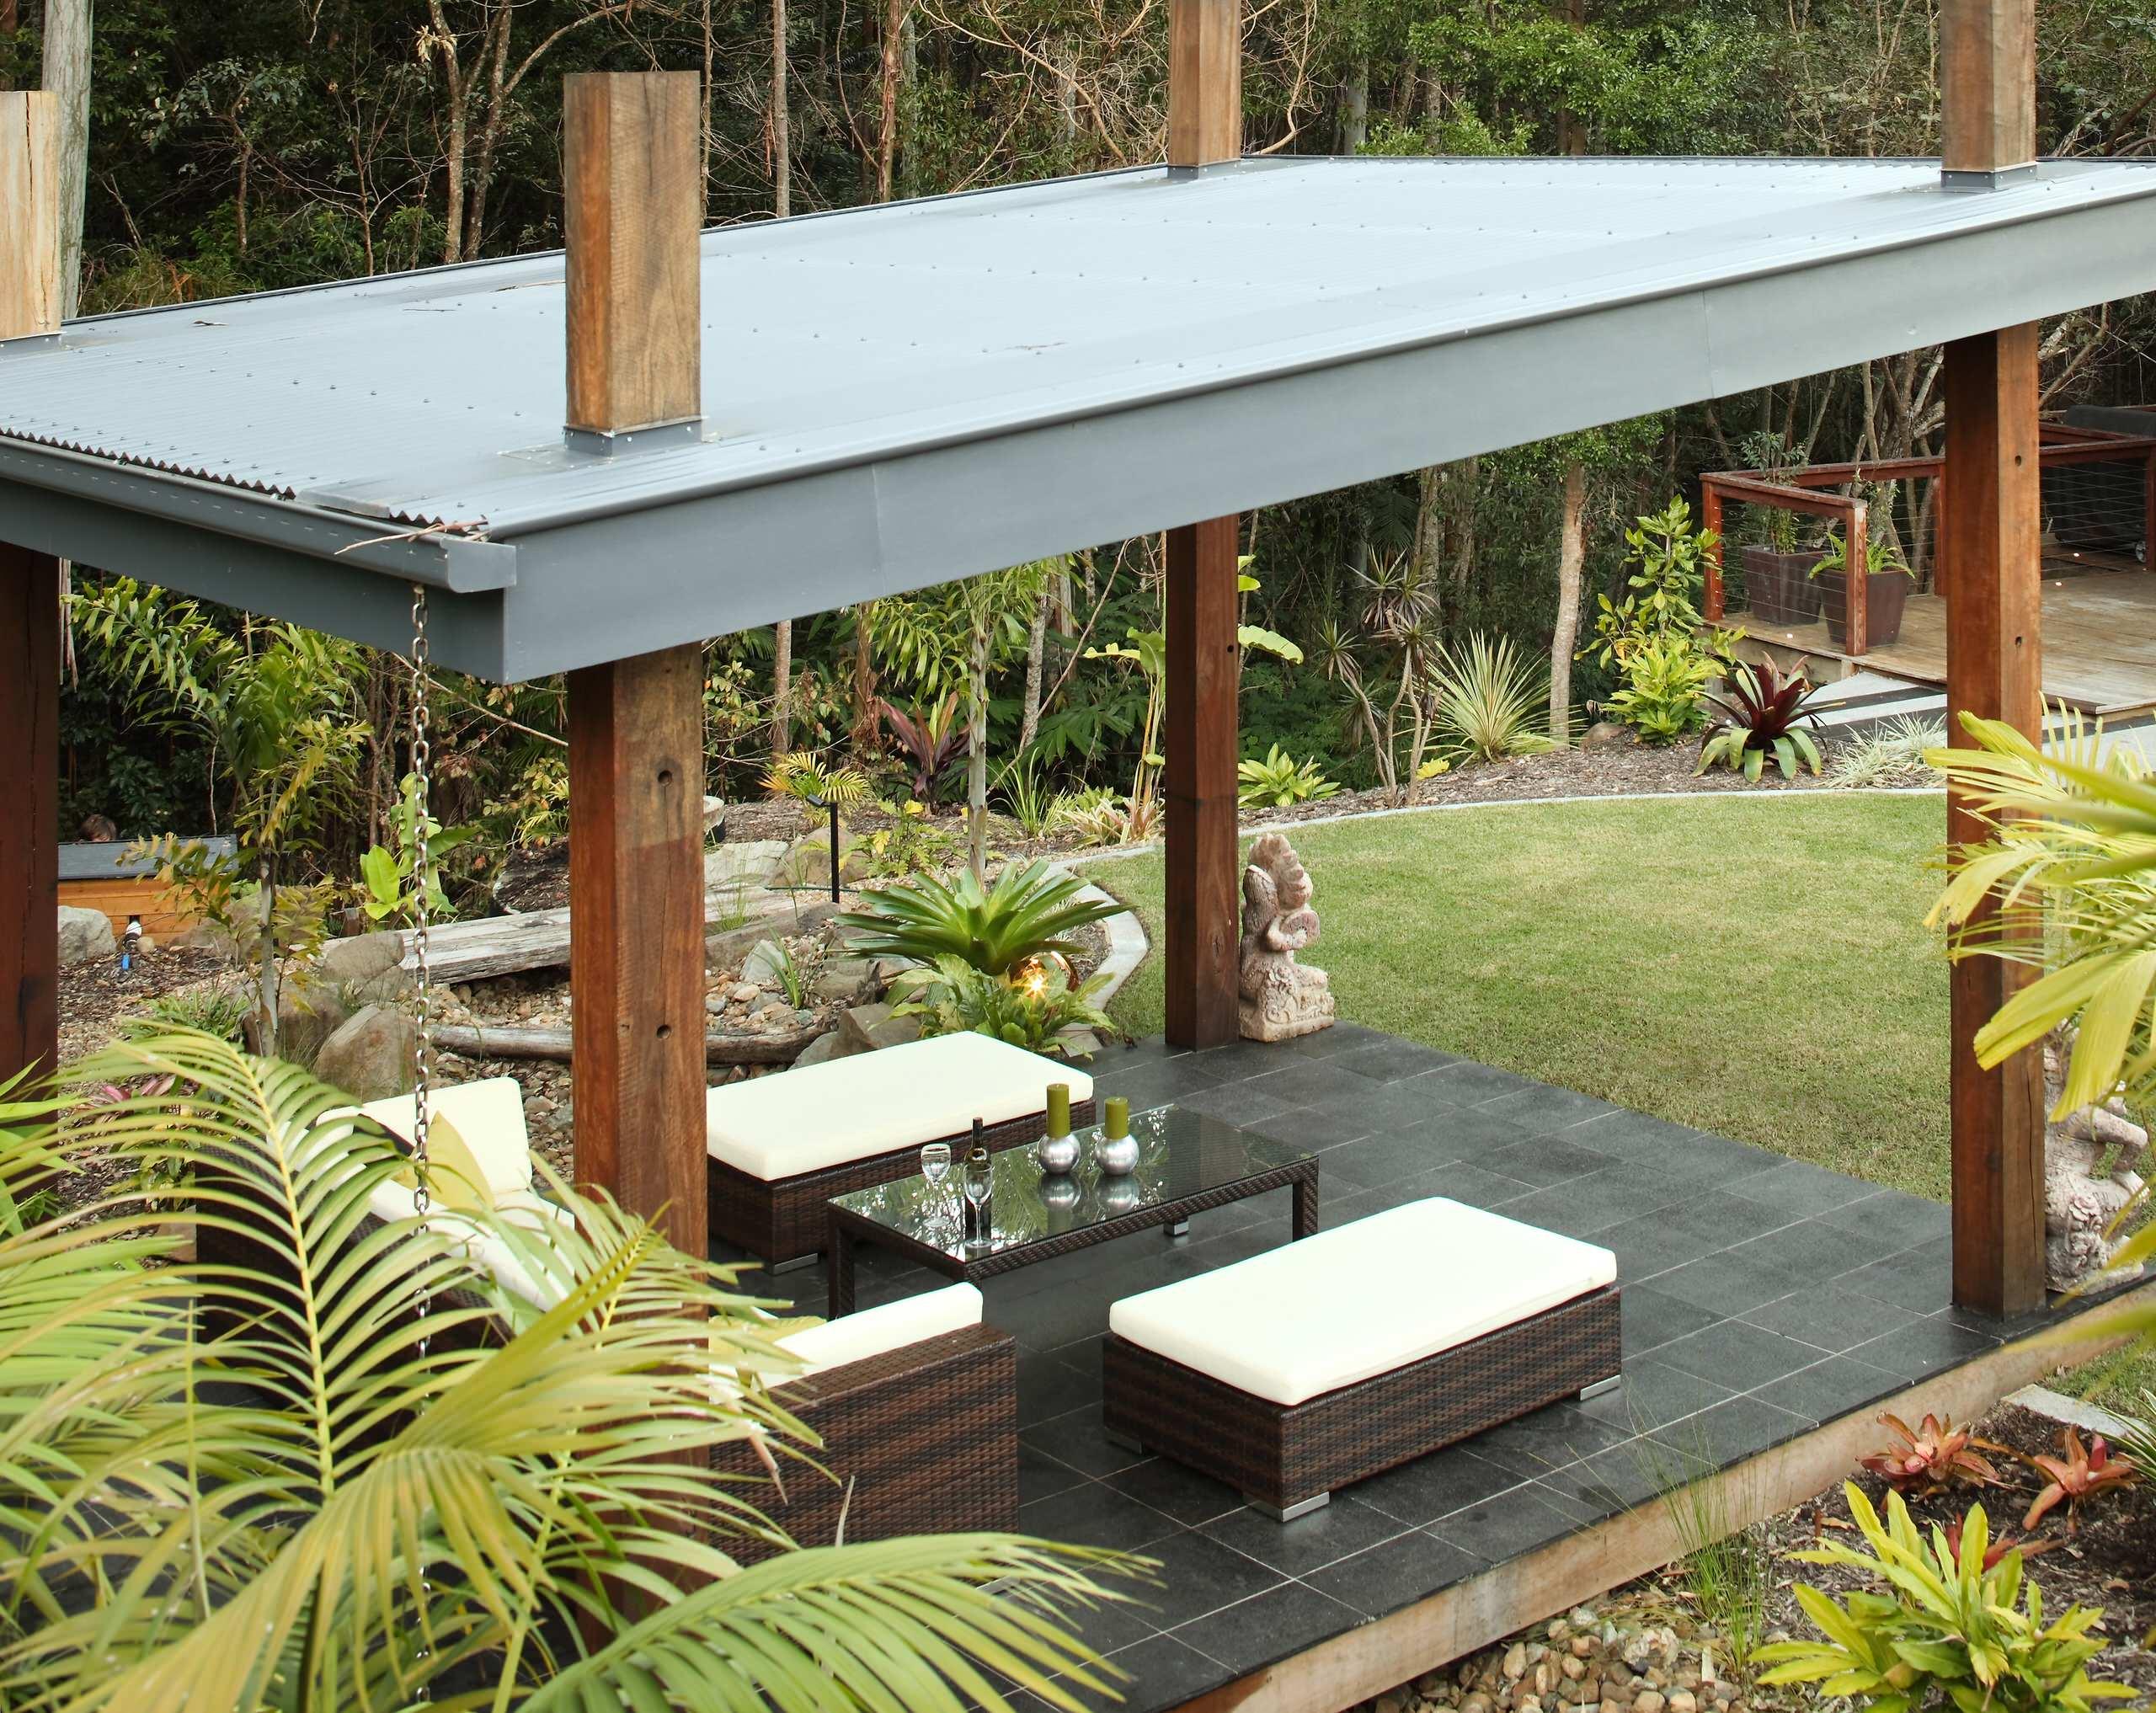 Corrugated Metal Roof Patio Ideas Photos Houzz